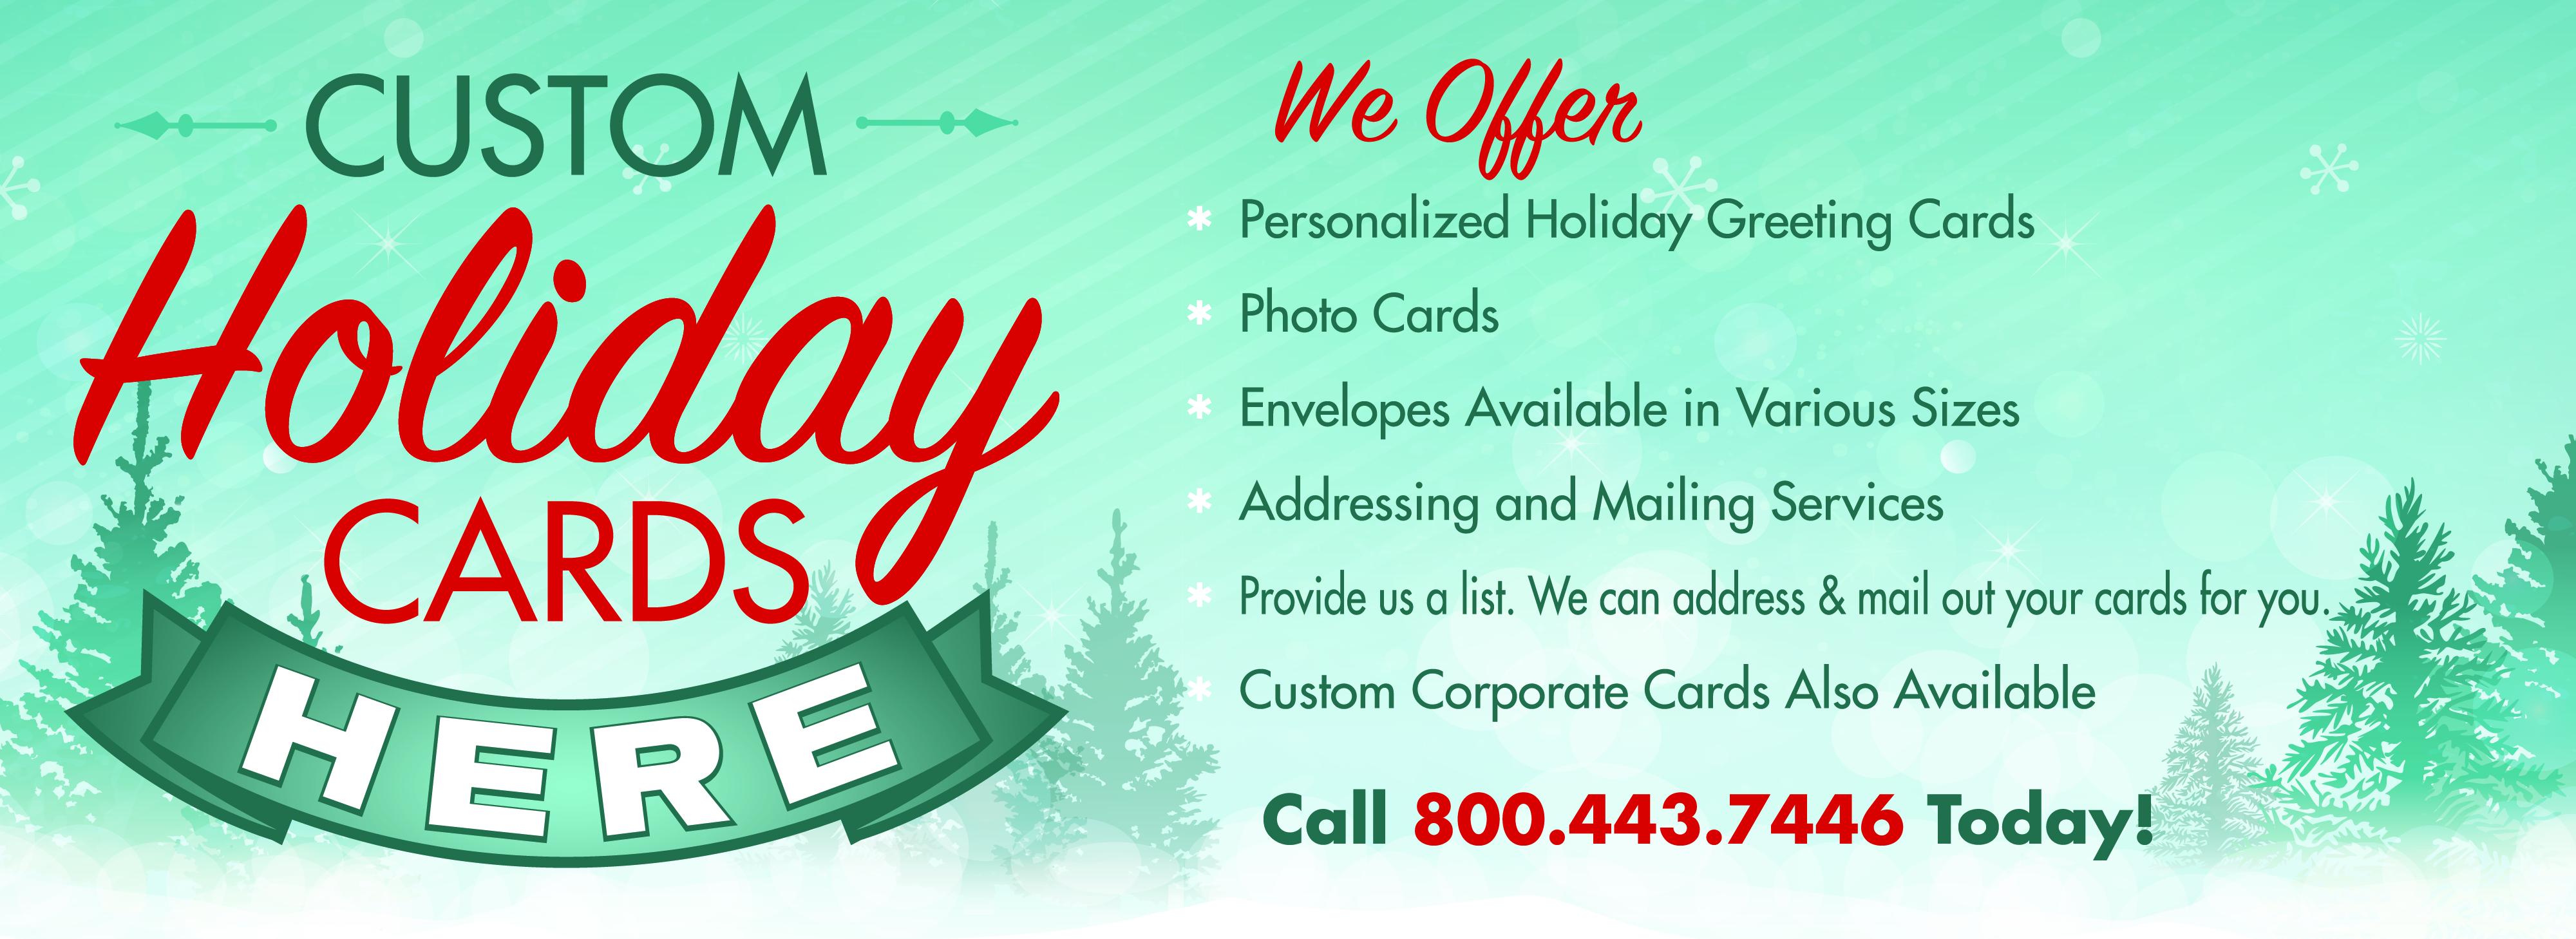 130271-Holiday-Webpage-Slider